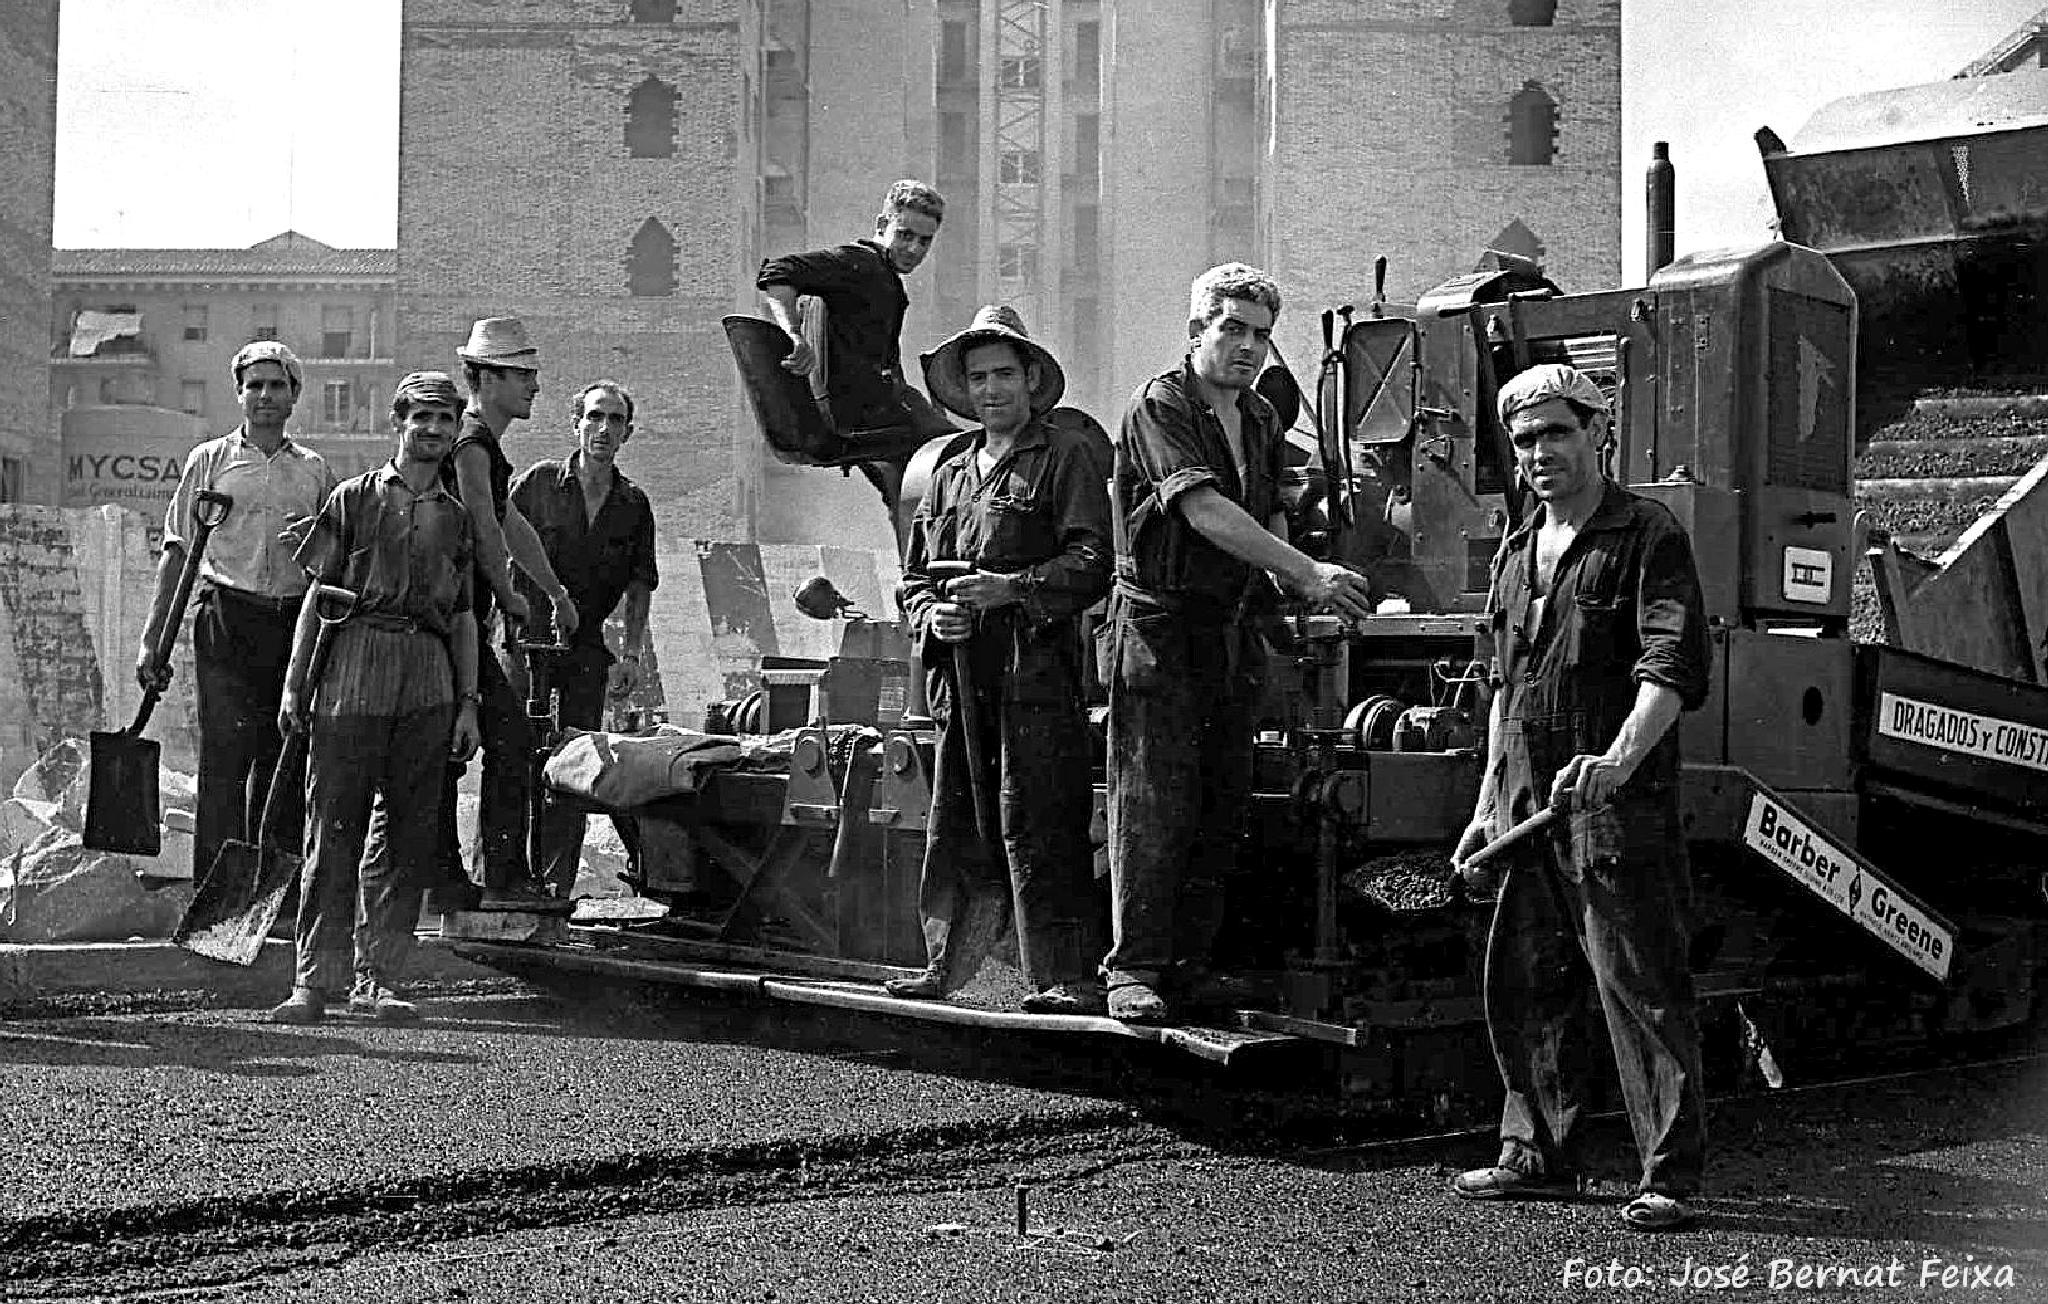 TRABAJADORES DE LA CARRETERA, WEGWERKERS, ROAD WORKERS,  Barcelona by José Bernat Feixa